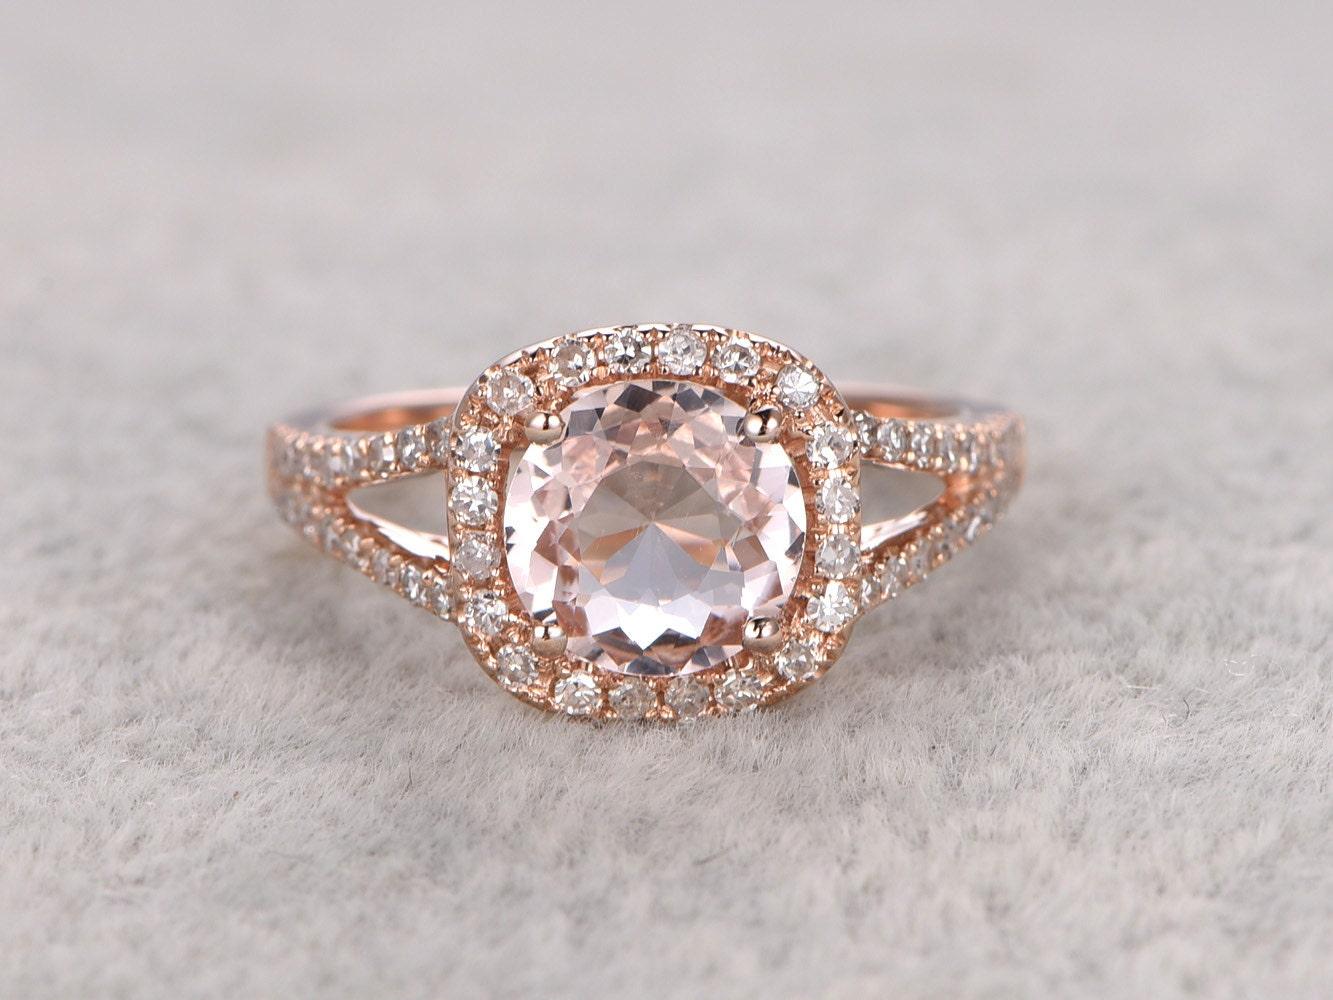 7mm morganite engagement ring rose golddiamond wedding. Black Bedroom Furniture Sets. Home Design Ideas